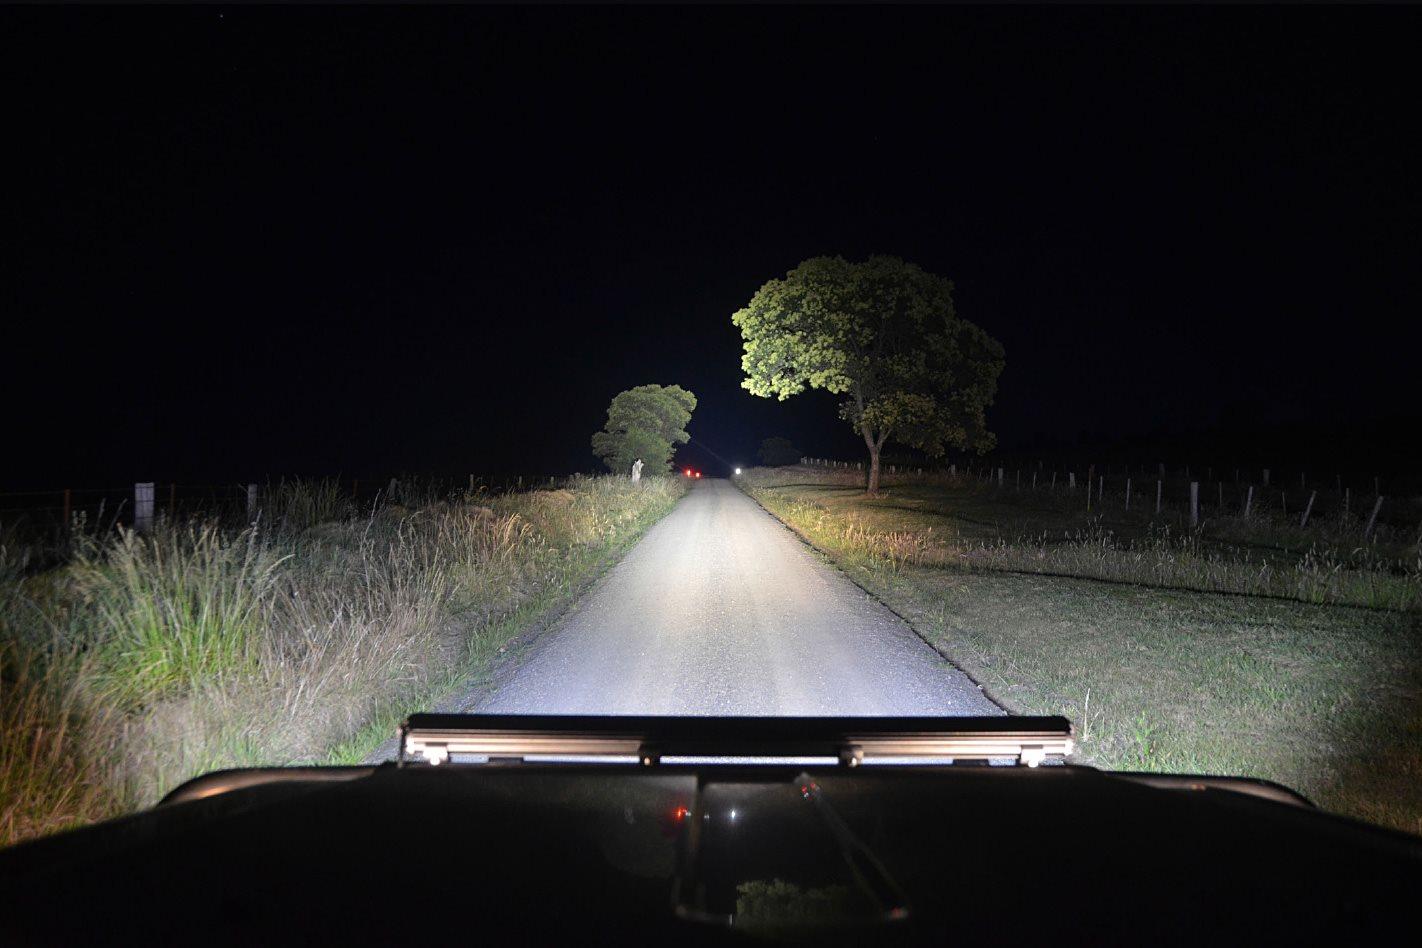 Halogen Vs Hid Vs Led Driving Lights 4x4 Australia